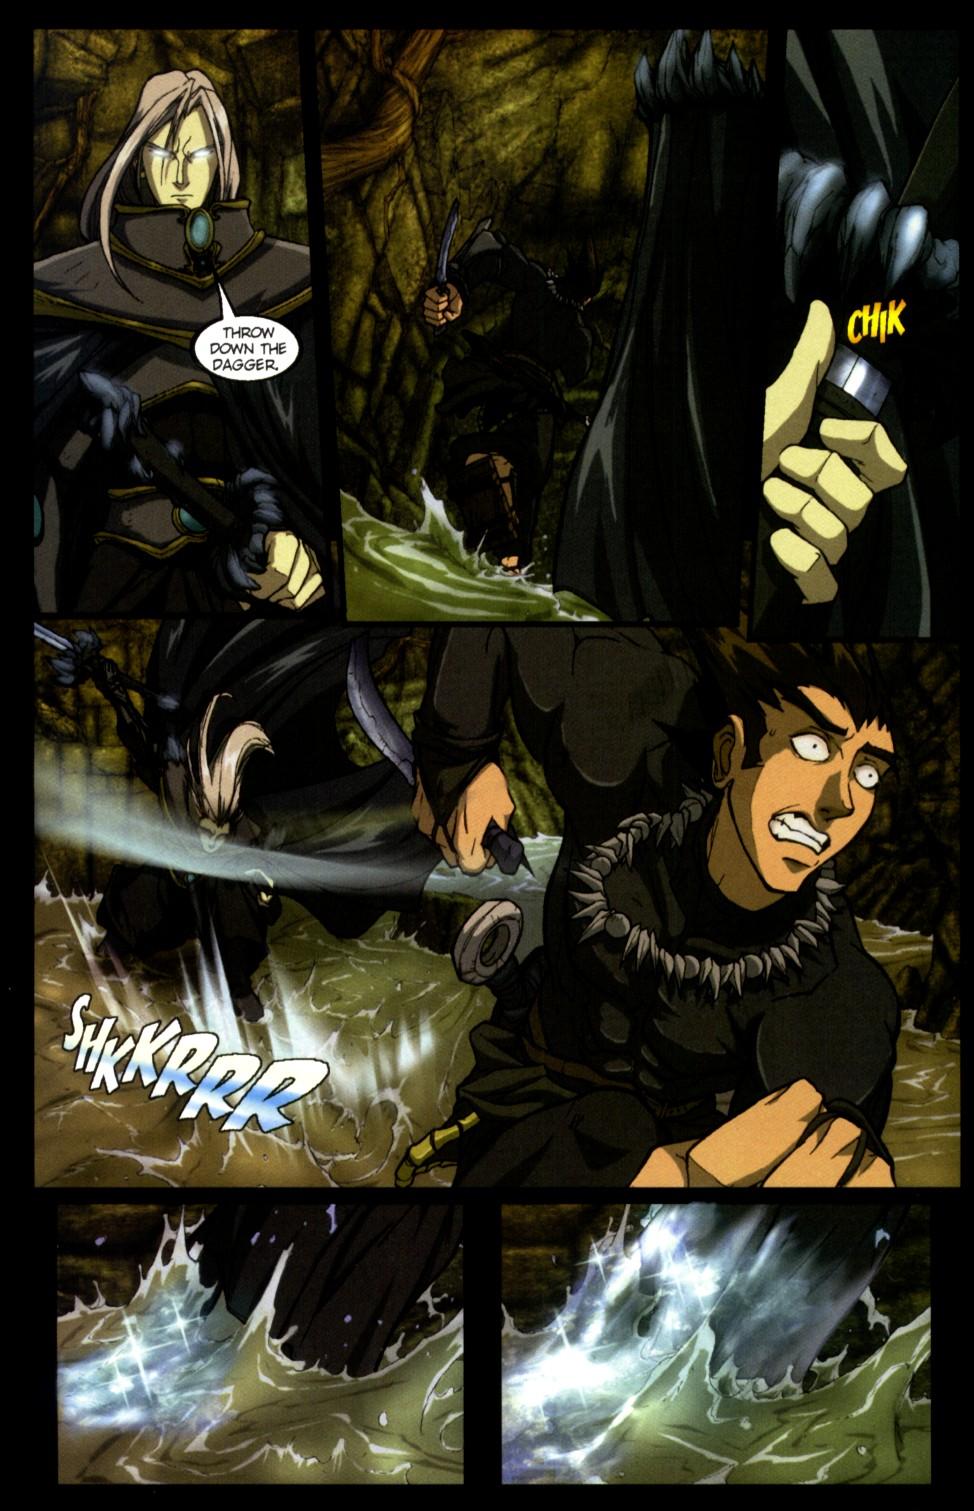 Read online Shidima comic -  Issue #3 - 19